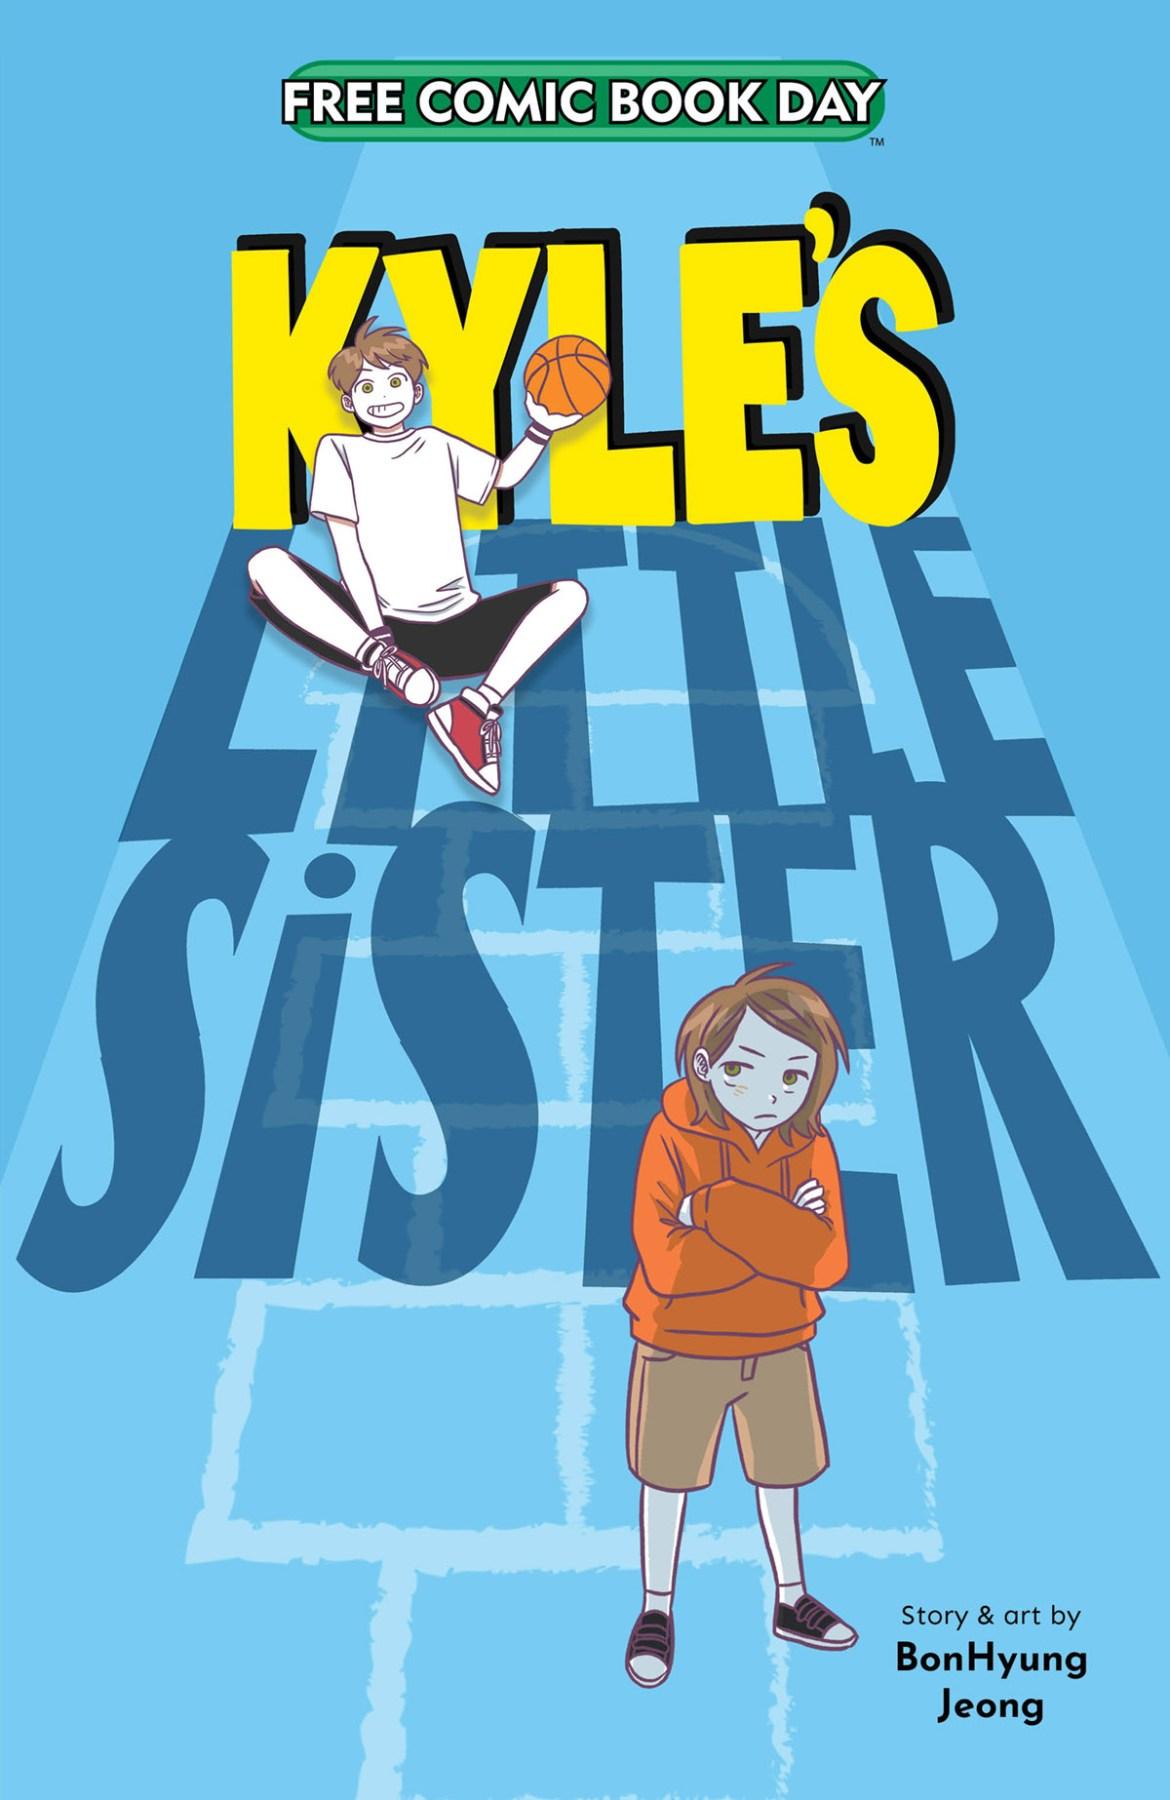 FCBD21_SILVER_JYen-Press_Kyles-Little-Sister Complete Free Comic Book Day 2021 comic book line-up announced